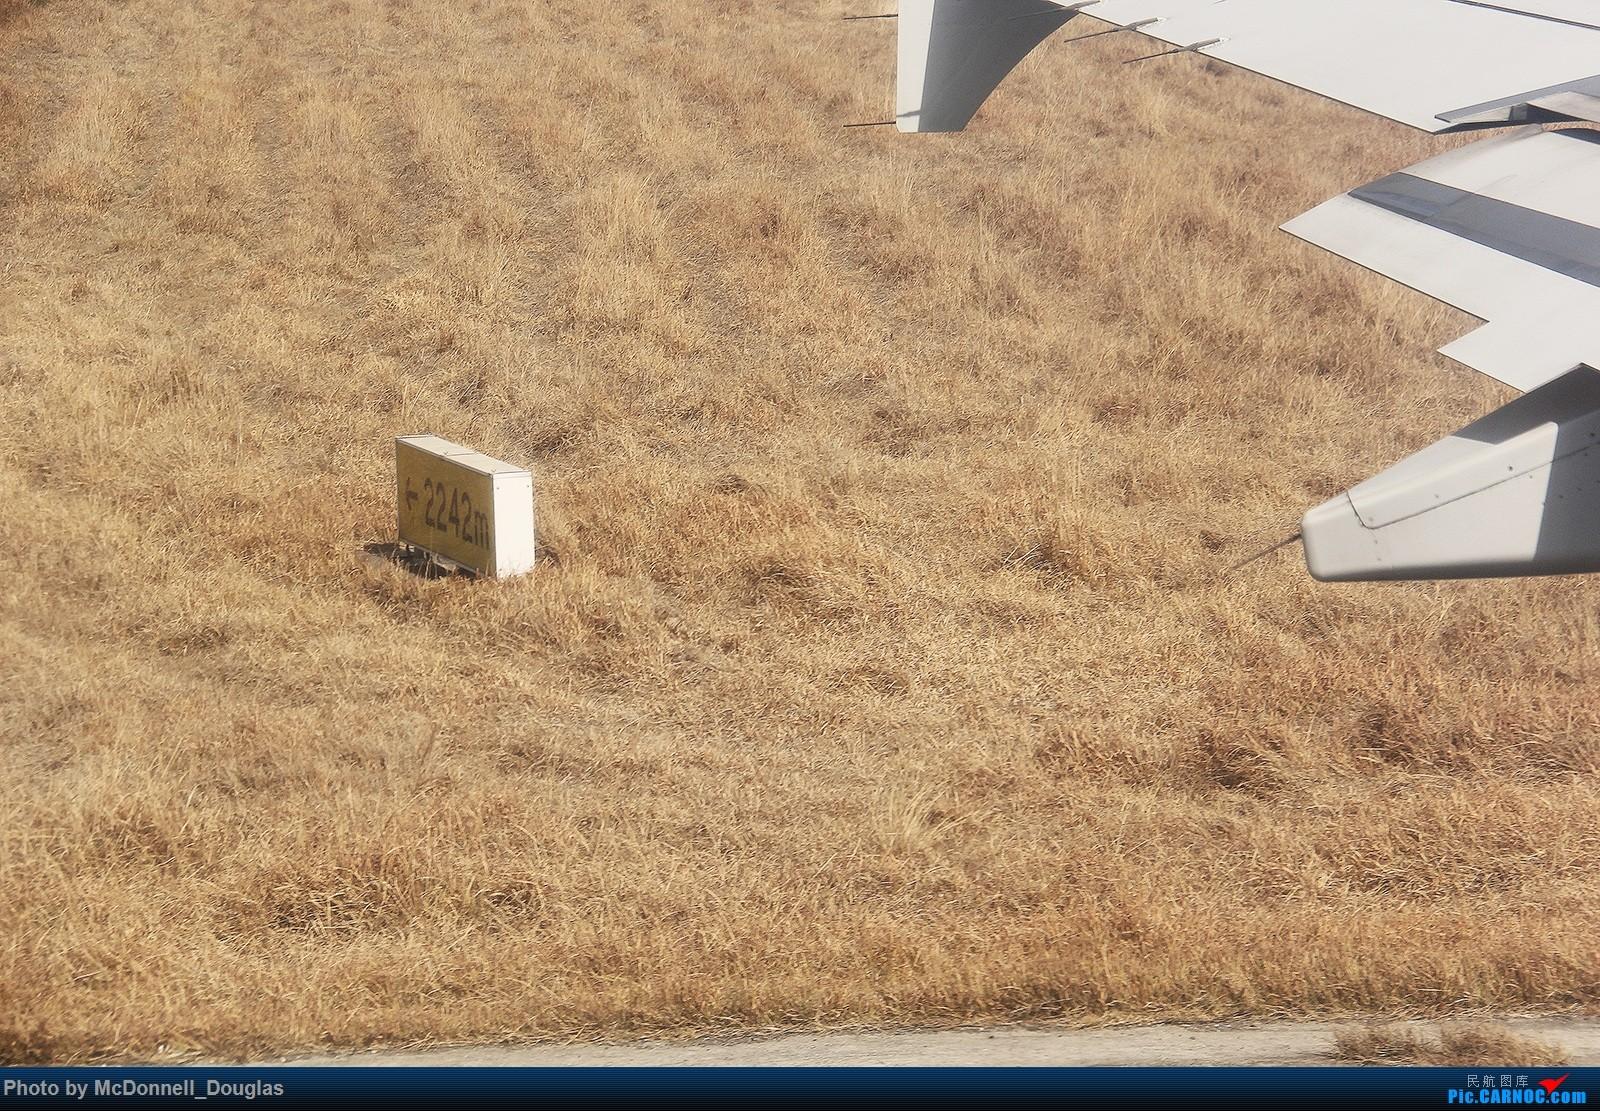 Re:[原创]【上海飞友会】【zc带你游天下(4)】不远千里飞跃喜马拉雅去看你,探寻高山另一边的神秘国度,和一群贫穷却快乐着的人们 MIL MI-8MTV-1 9N-AHT 尼泊尔加德满都特里布万国际机场 尼泊尔加德满都特里布万国际机场